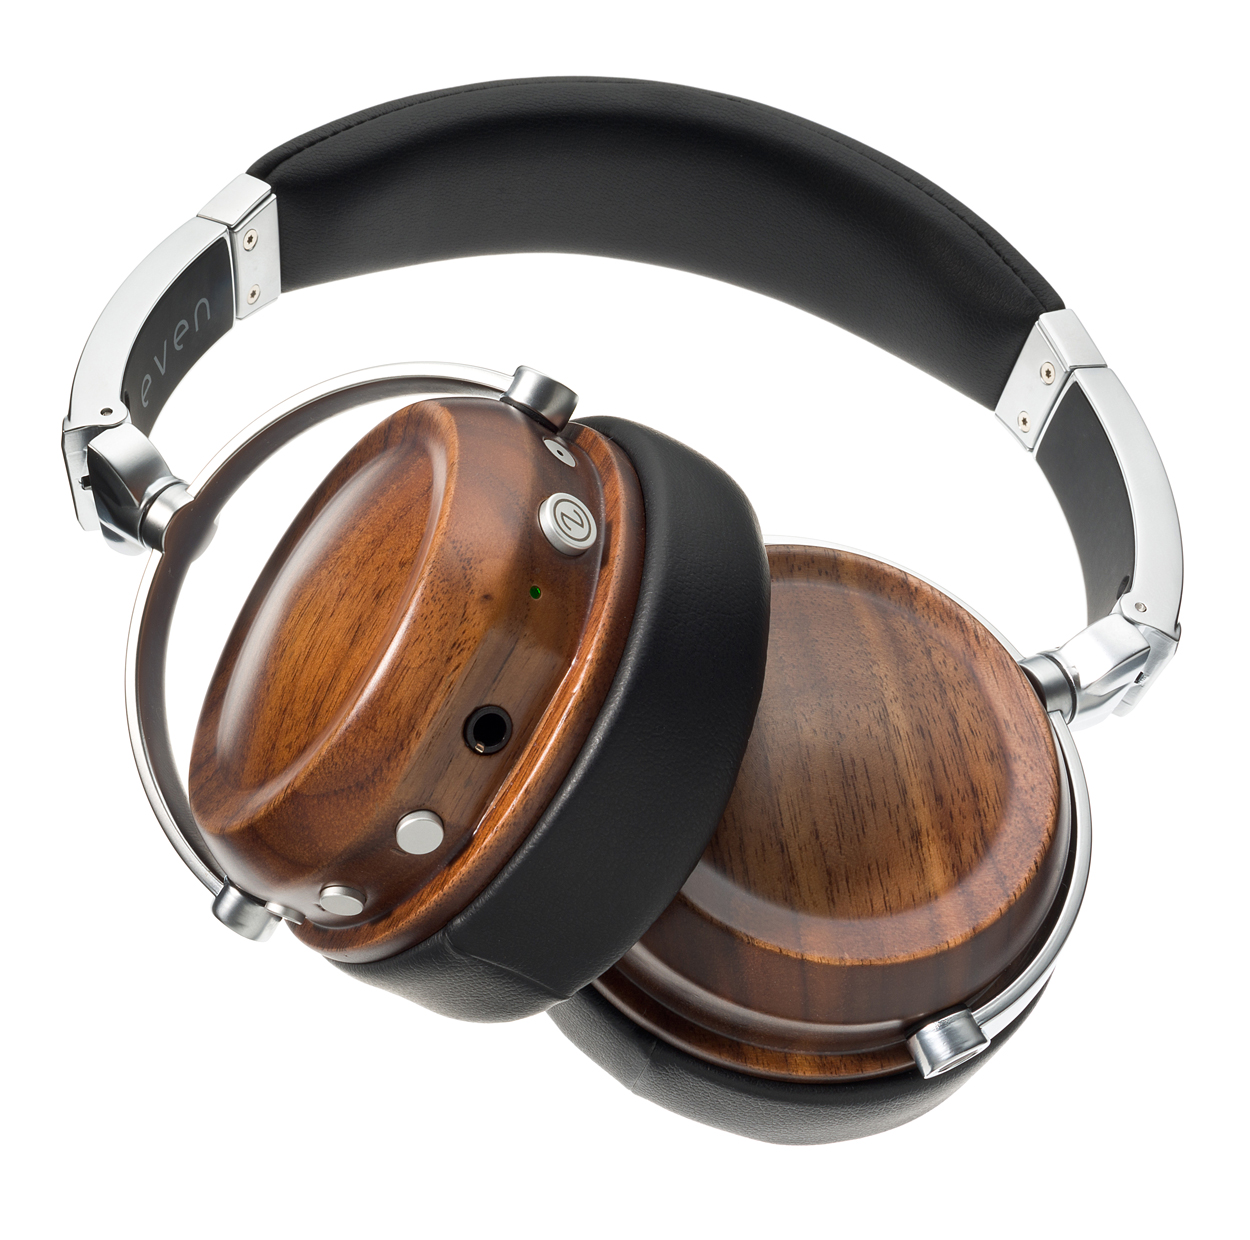 Even Headphone brand